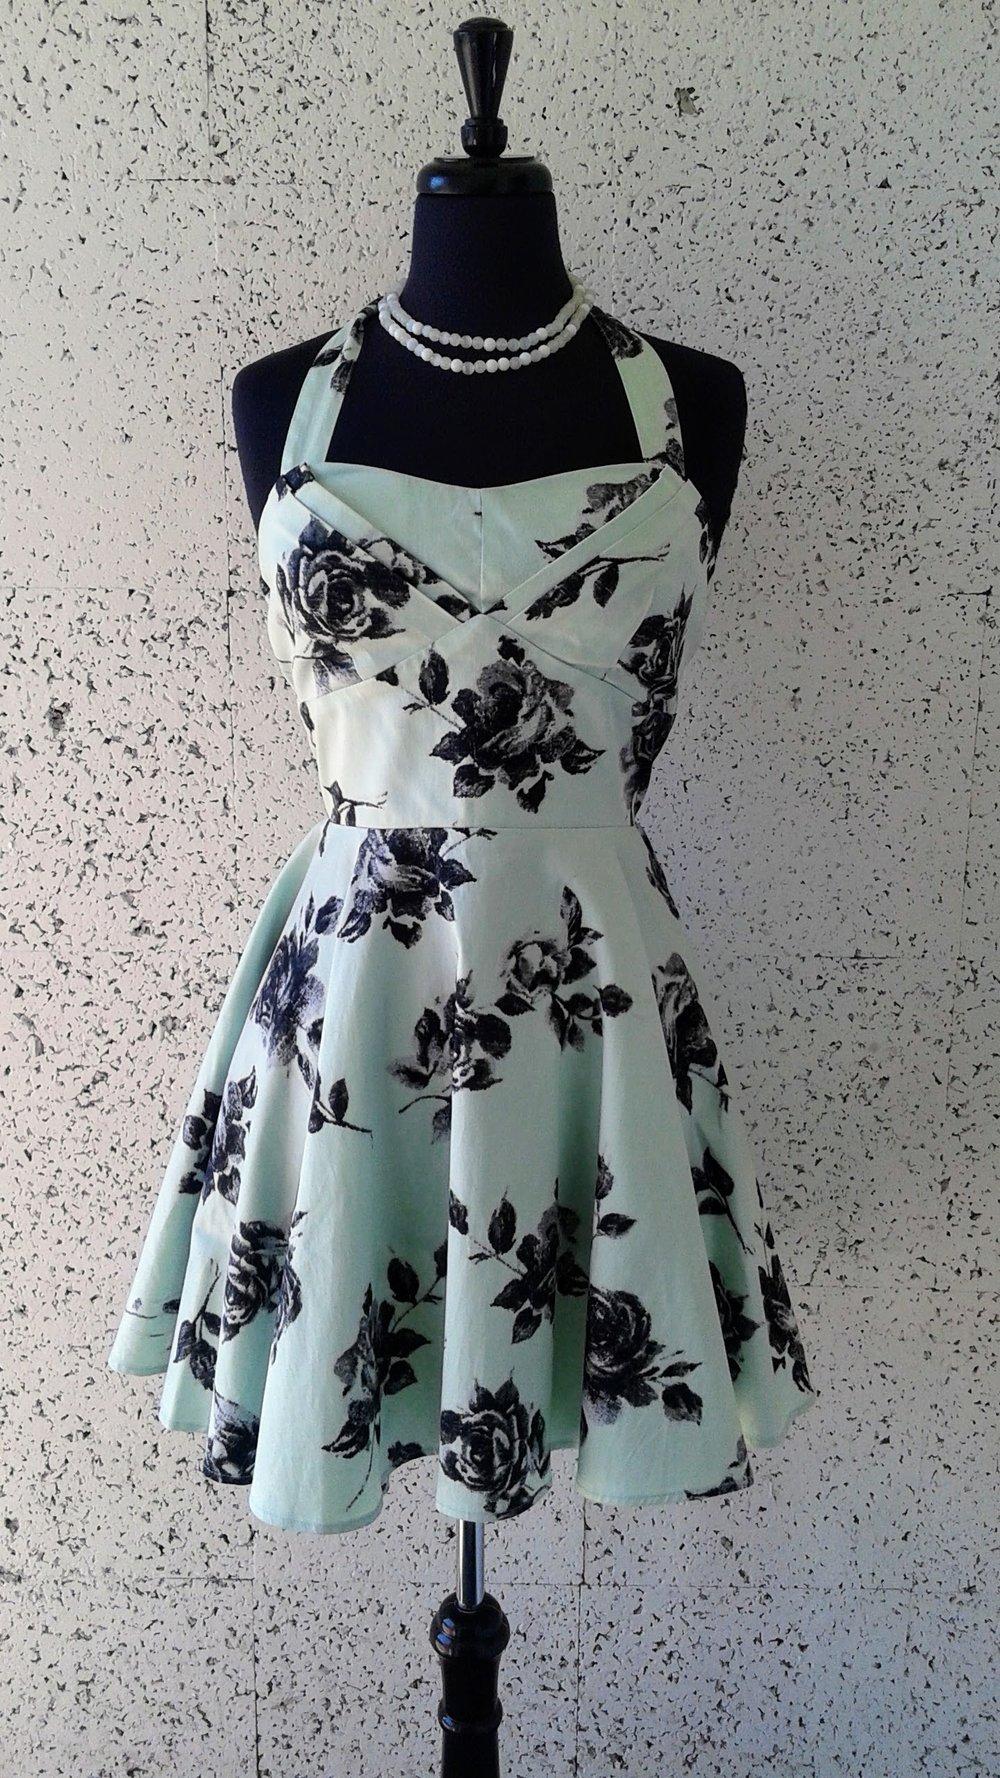 Iya dress; Size M, $30